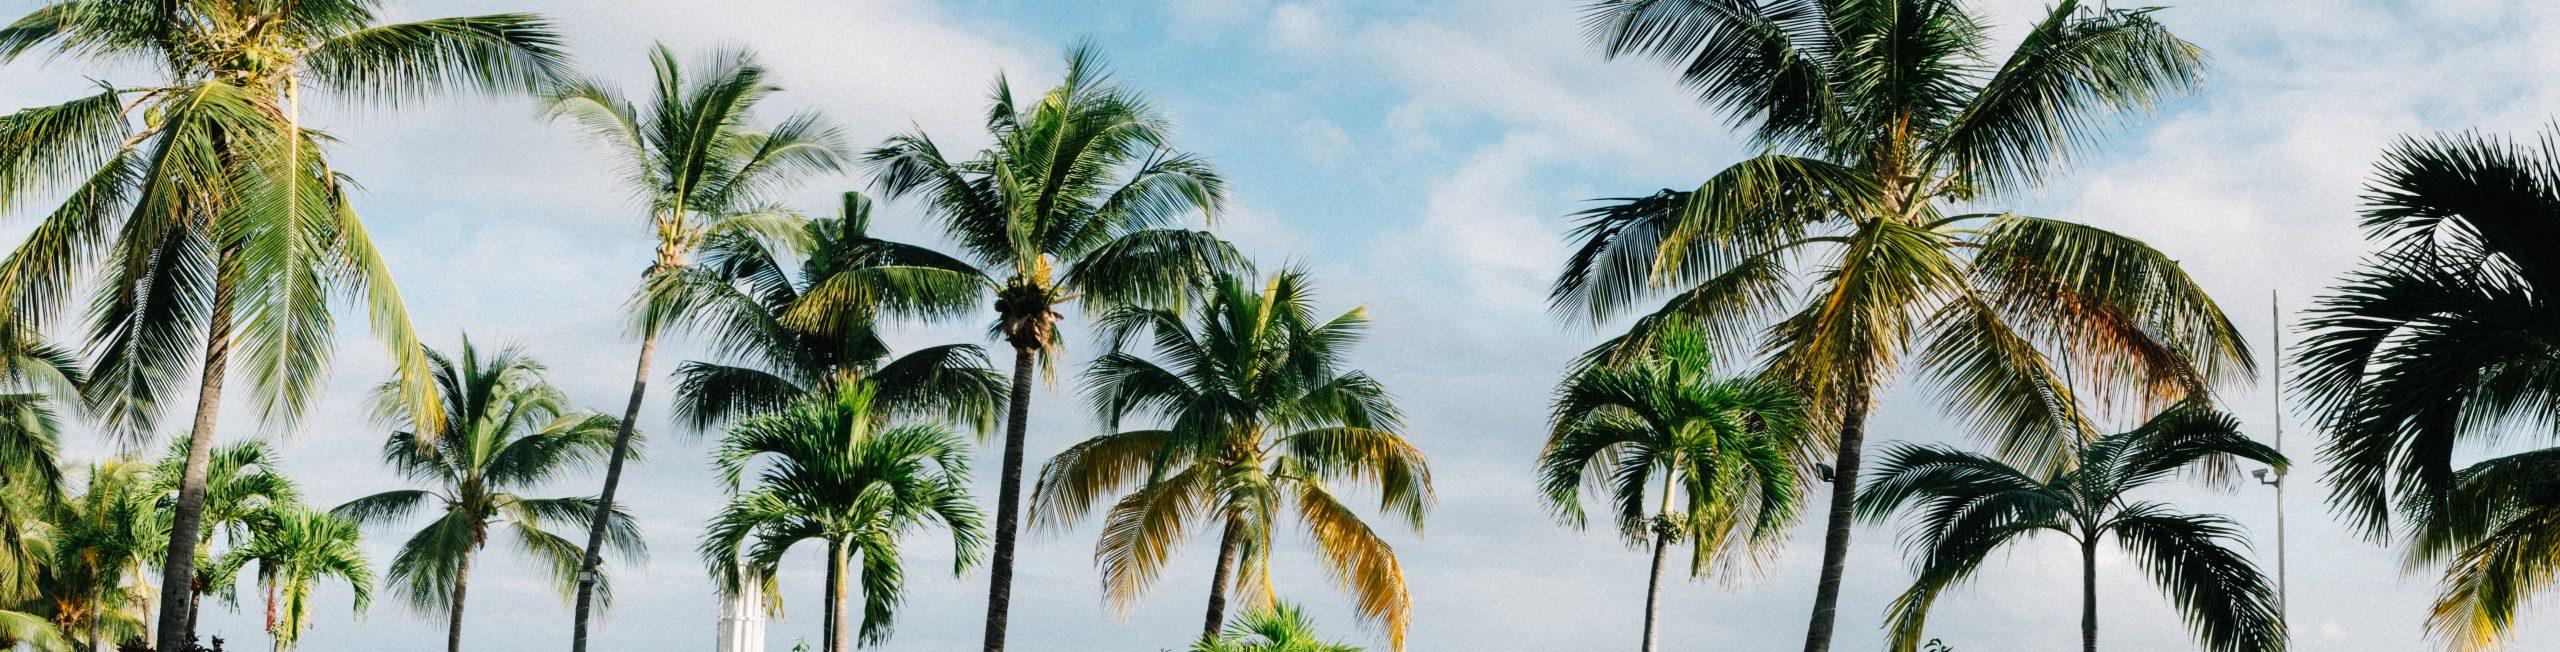 Mauritius trees